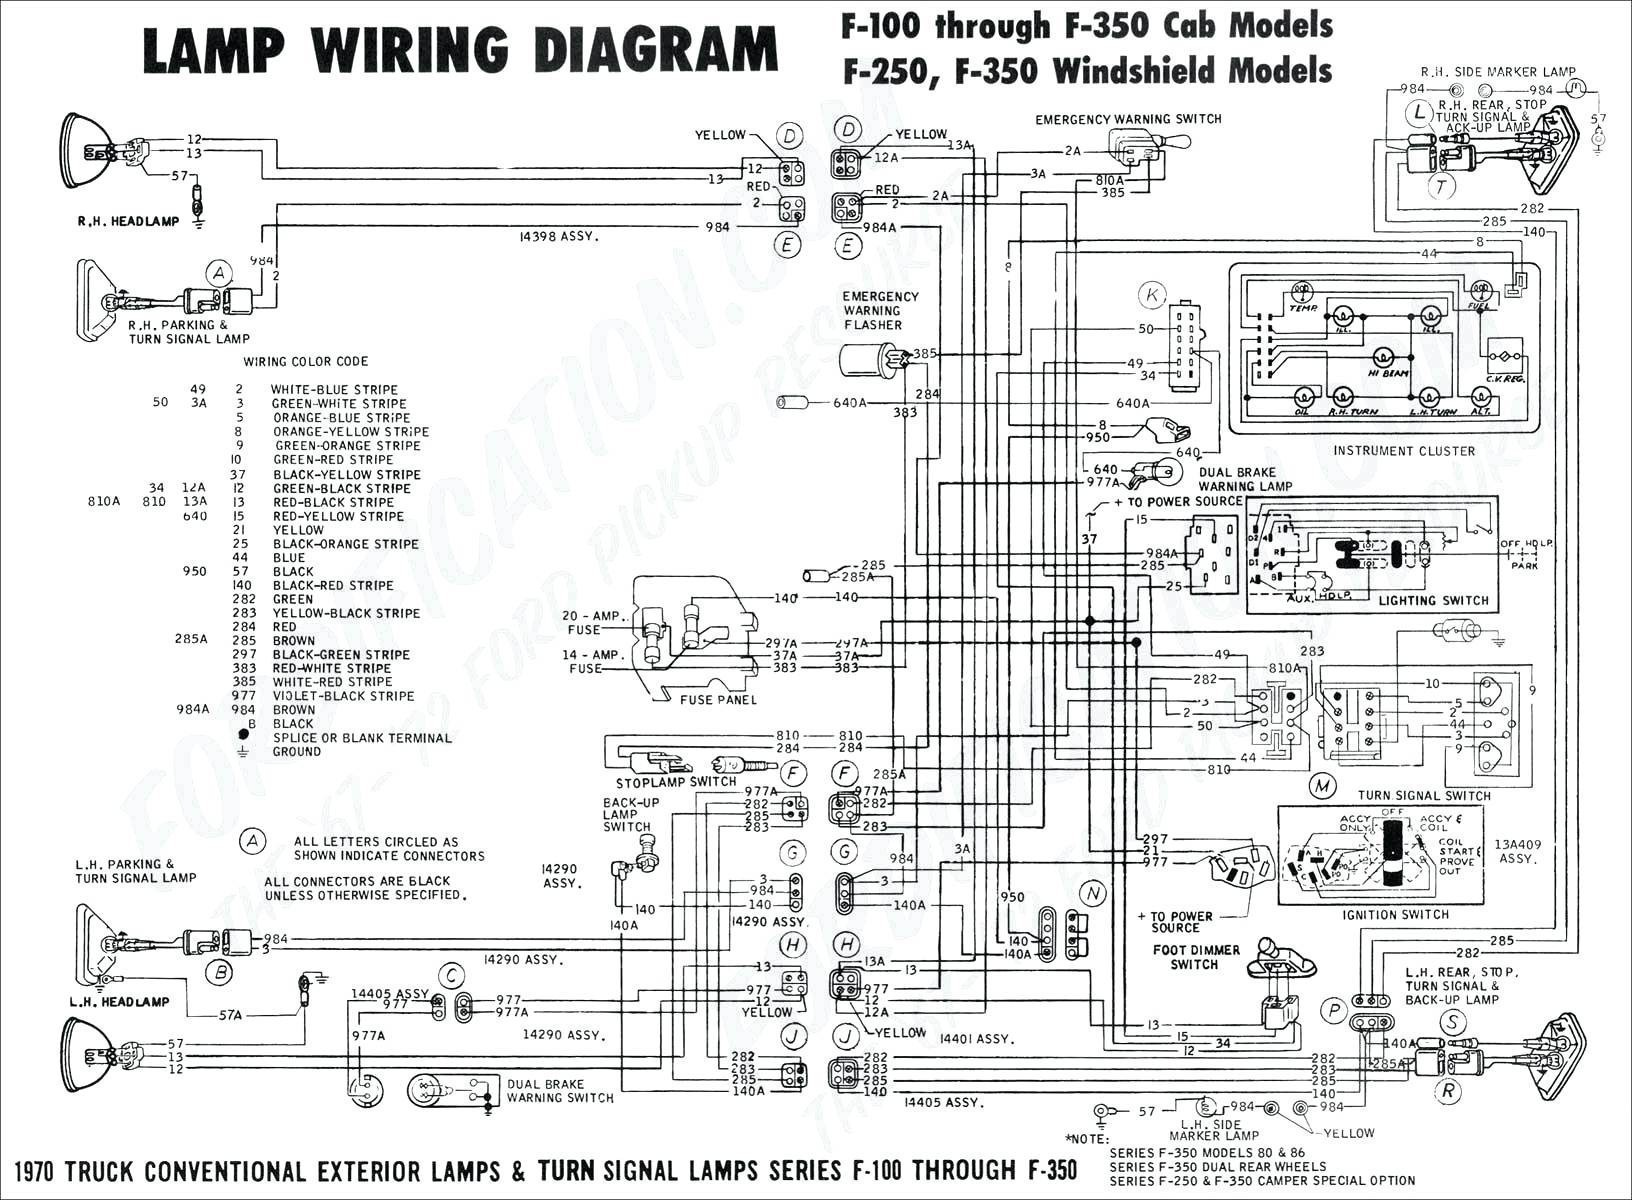 Superb Wiring Techteazer Com Wiring Cloud Inklaidewilluminateatxorg